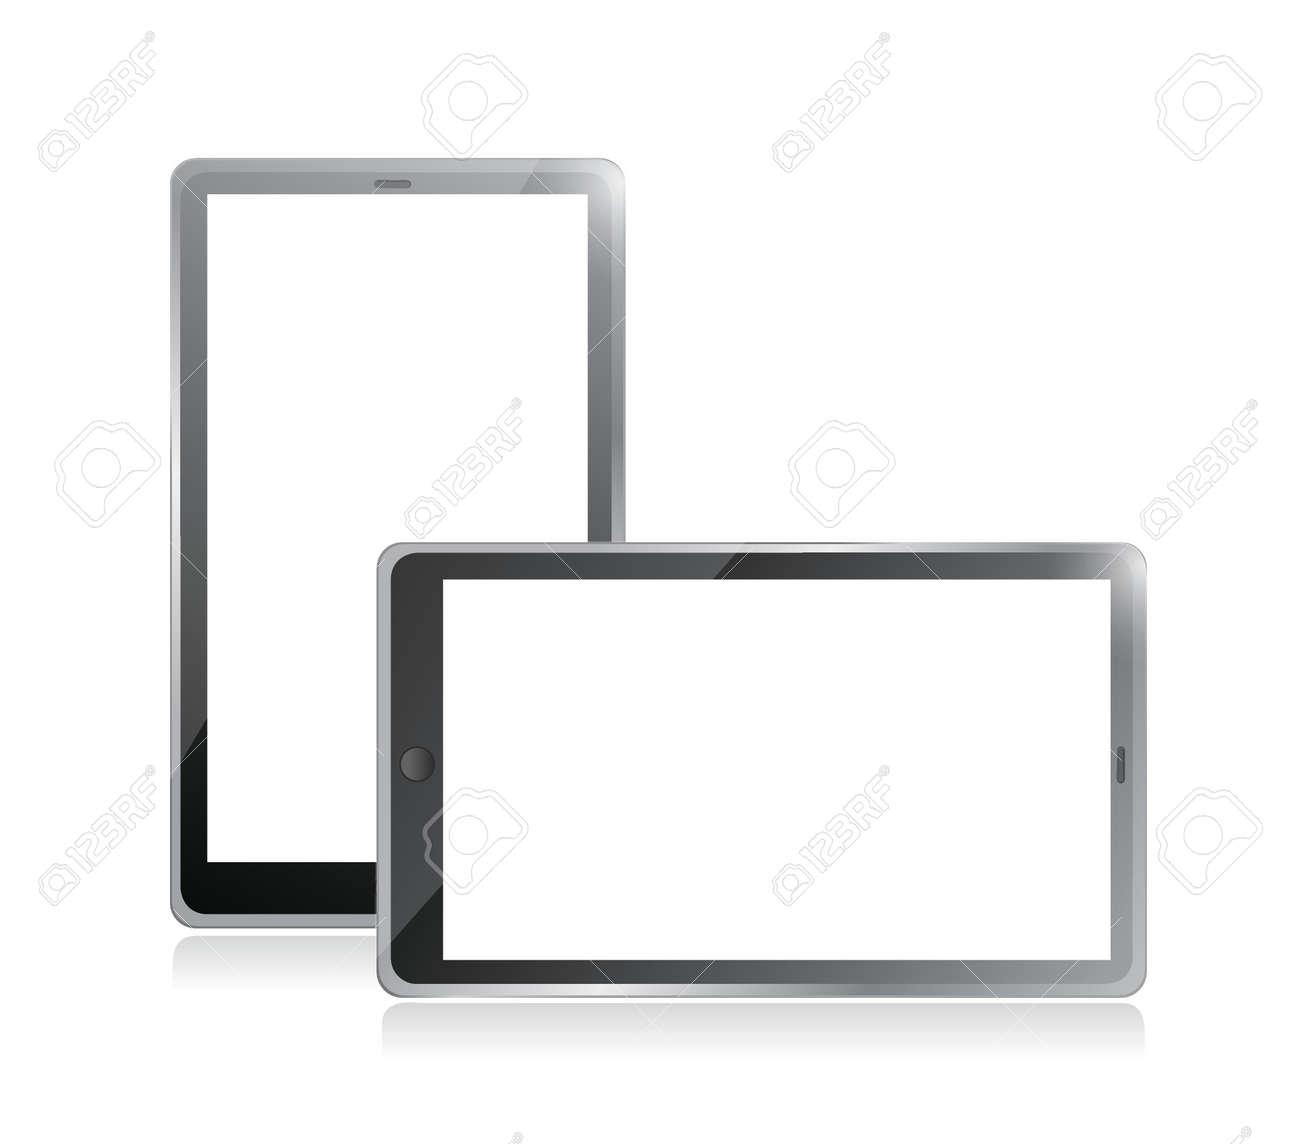 Black tablets pc illustration design on white background Stock Vector - 20510585